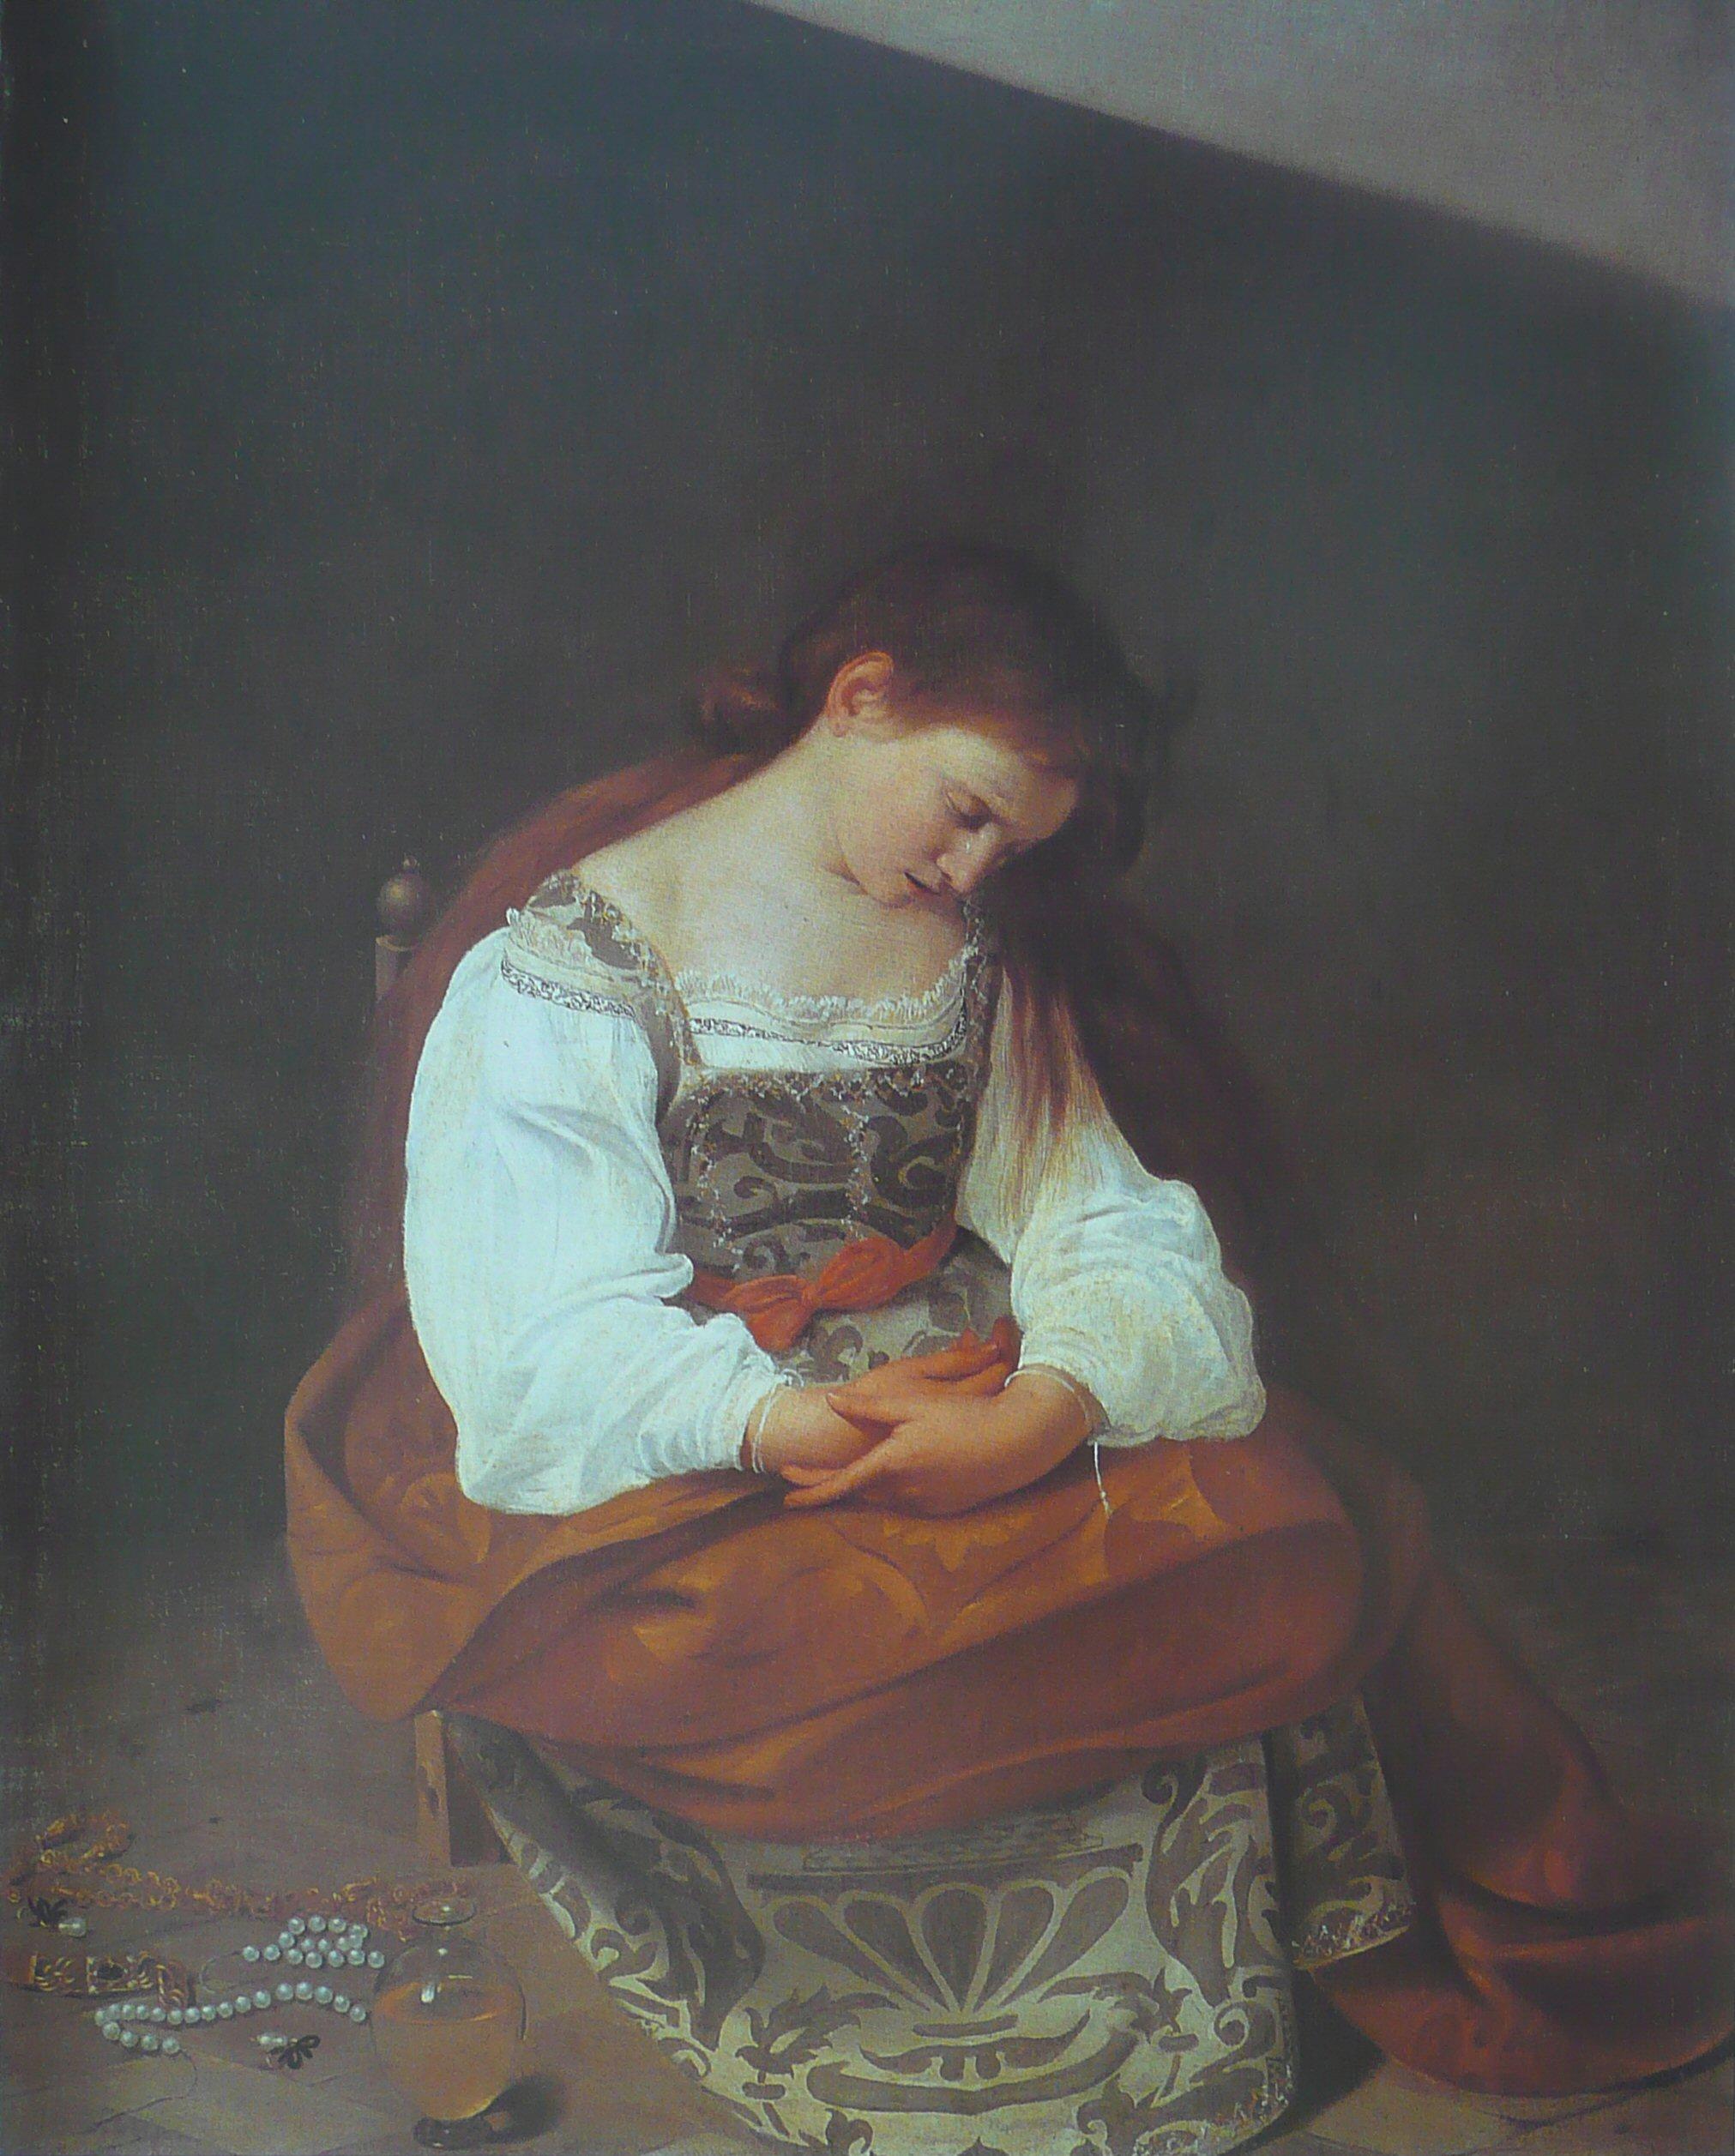 http://upload.wikimedia.org/wikipedia/commons/2/20/Michelangelo_Merisi_da_Caravaggio_-_Madeleine_repentante.jpg